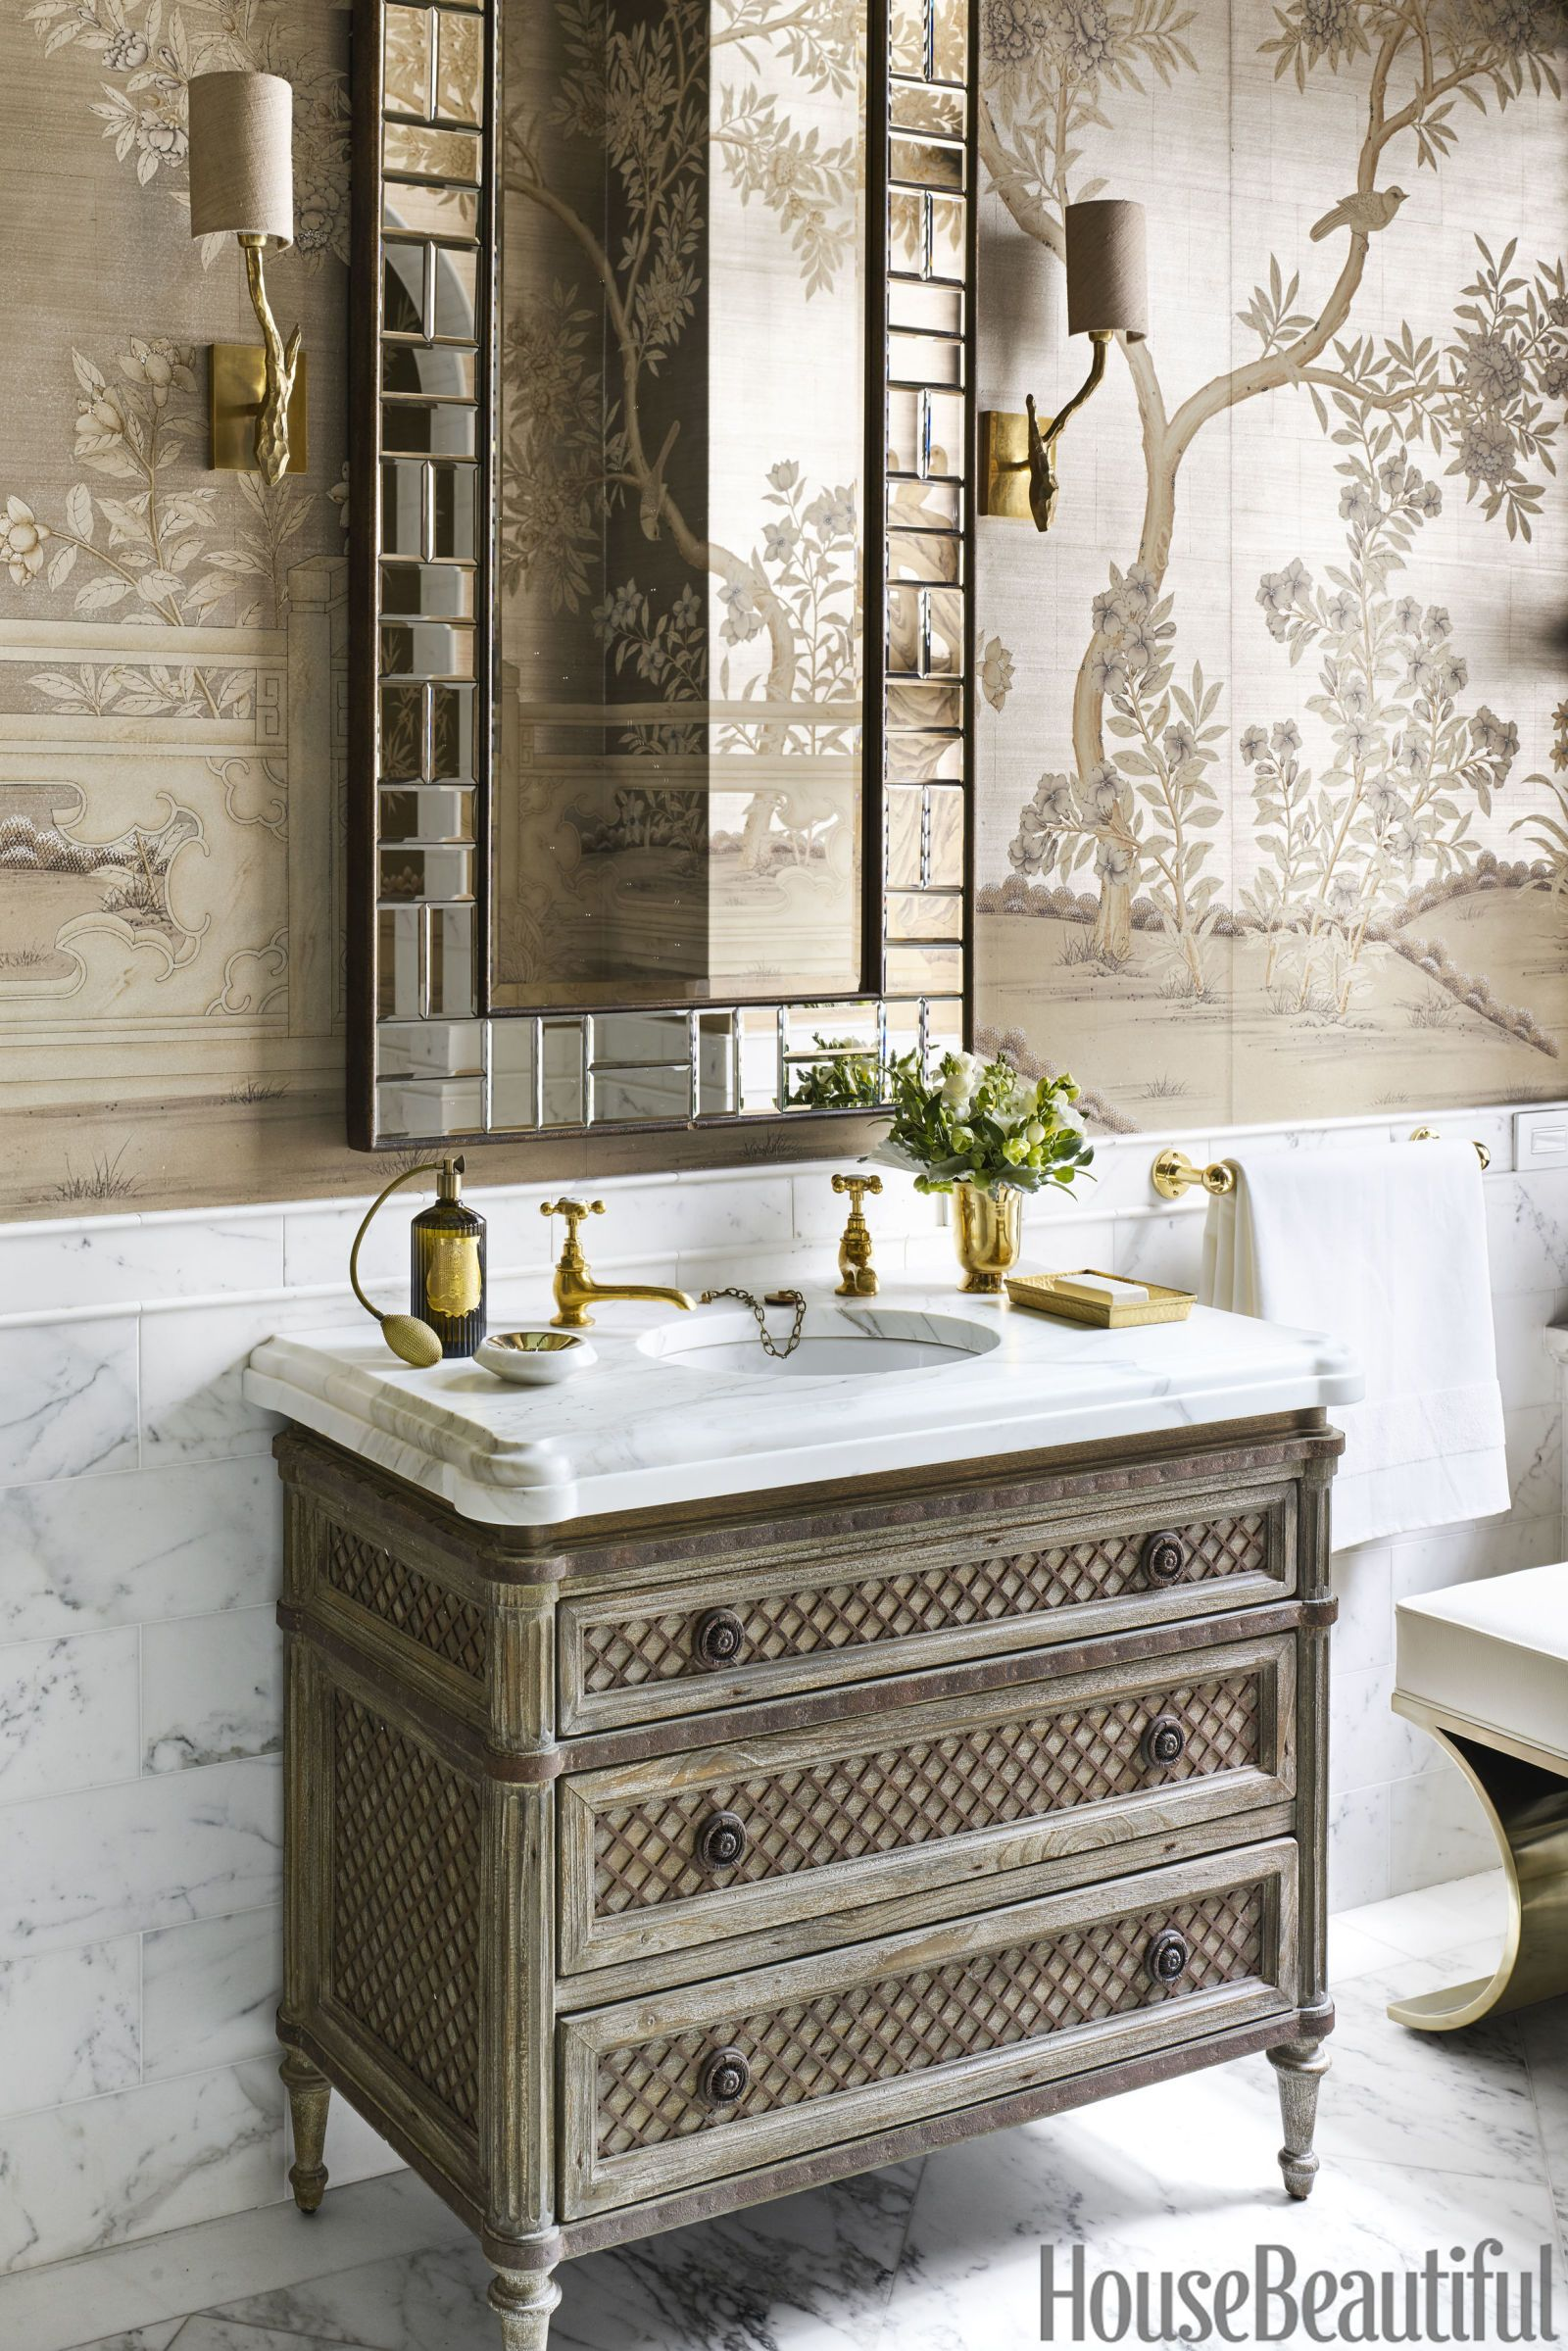 Step Inside This Gigantic Manhattan Bathroom